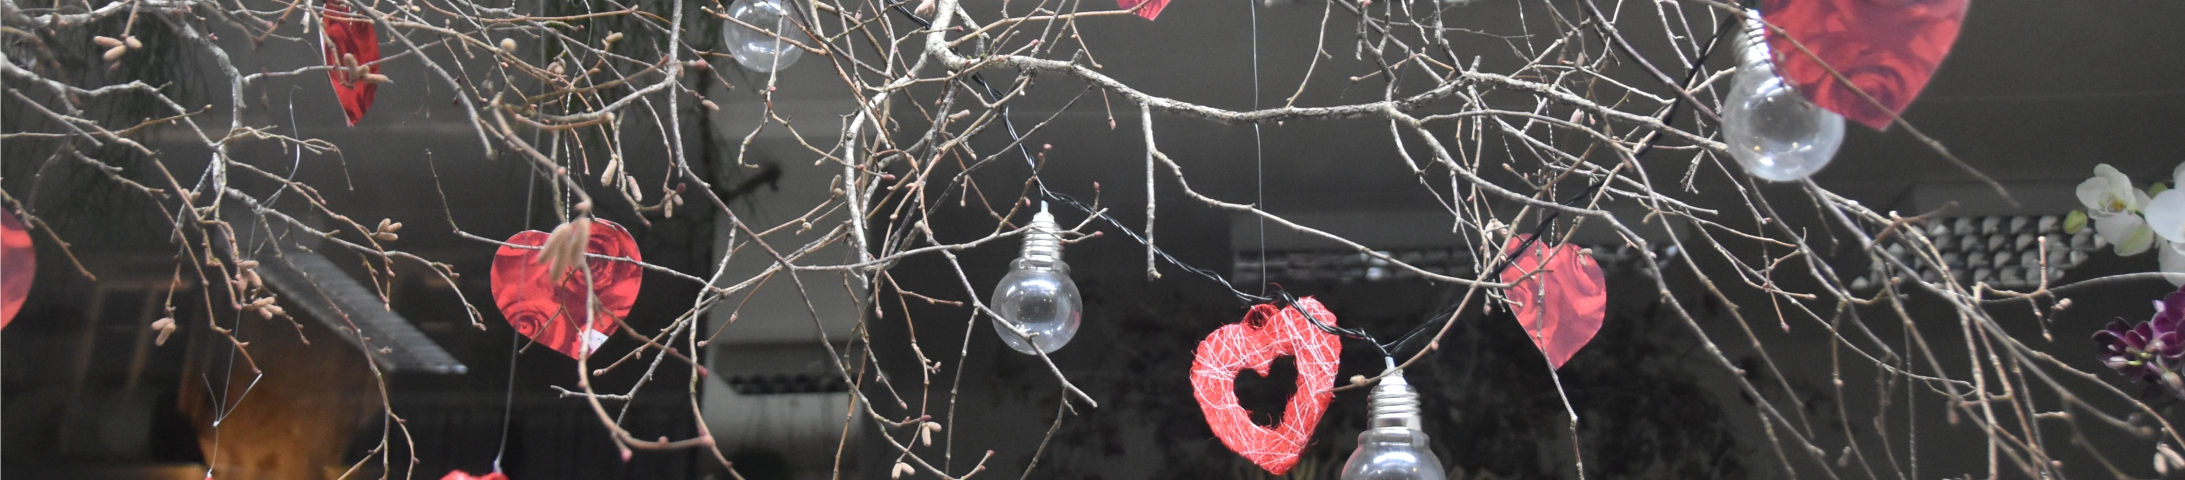 Les vitrines gagnantes de la St-Valentin 2021